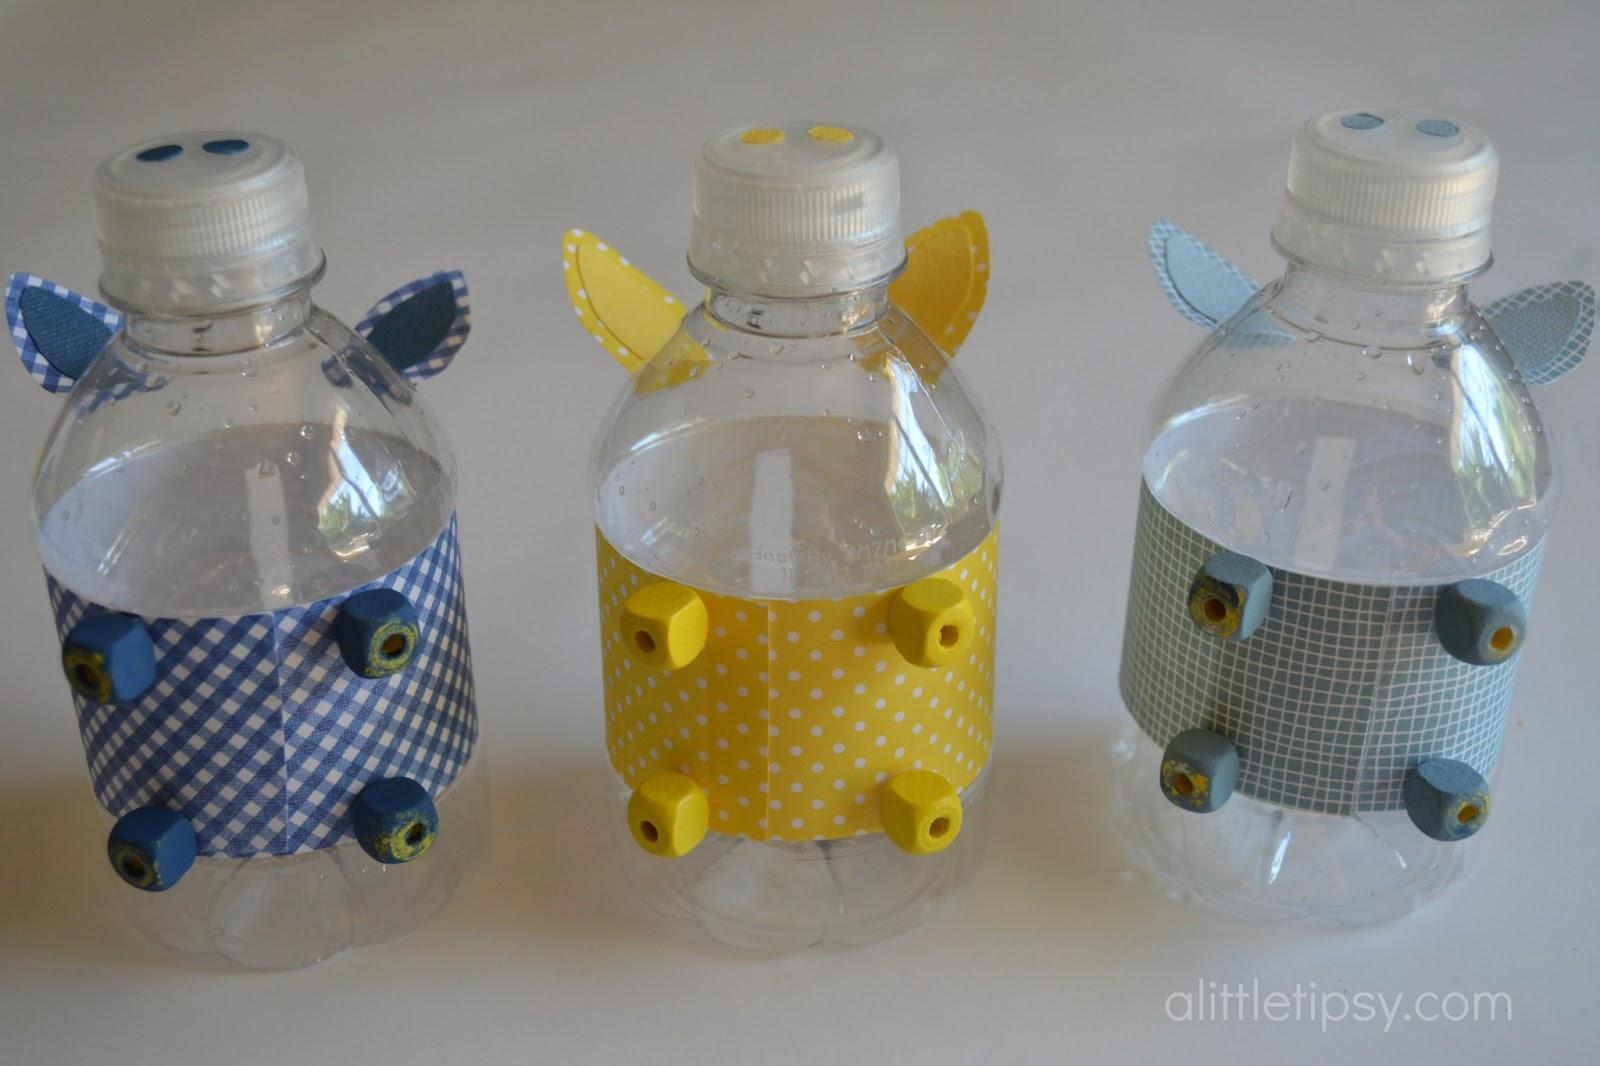 Diy plastic bottle piggy bank for Plastic bottle coin bank